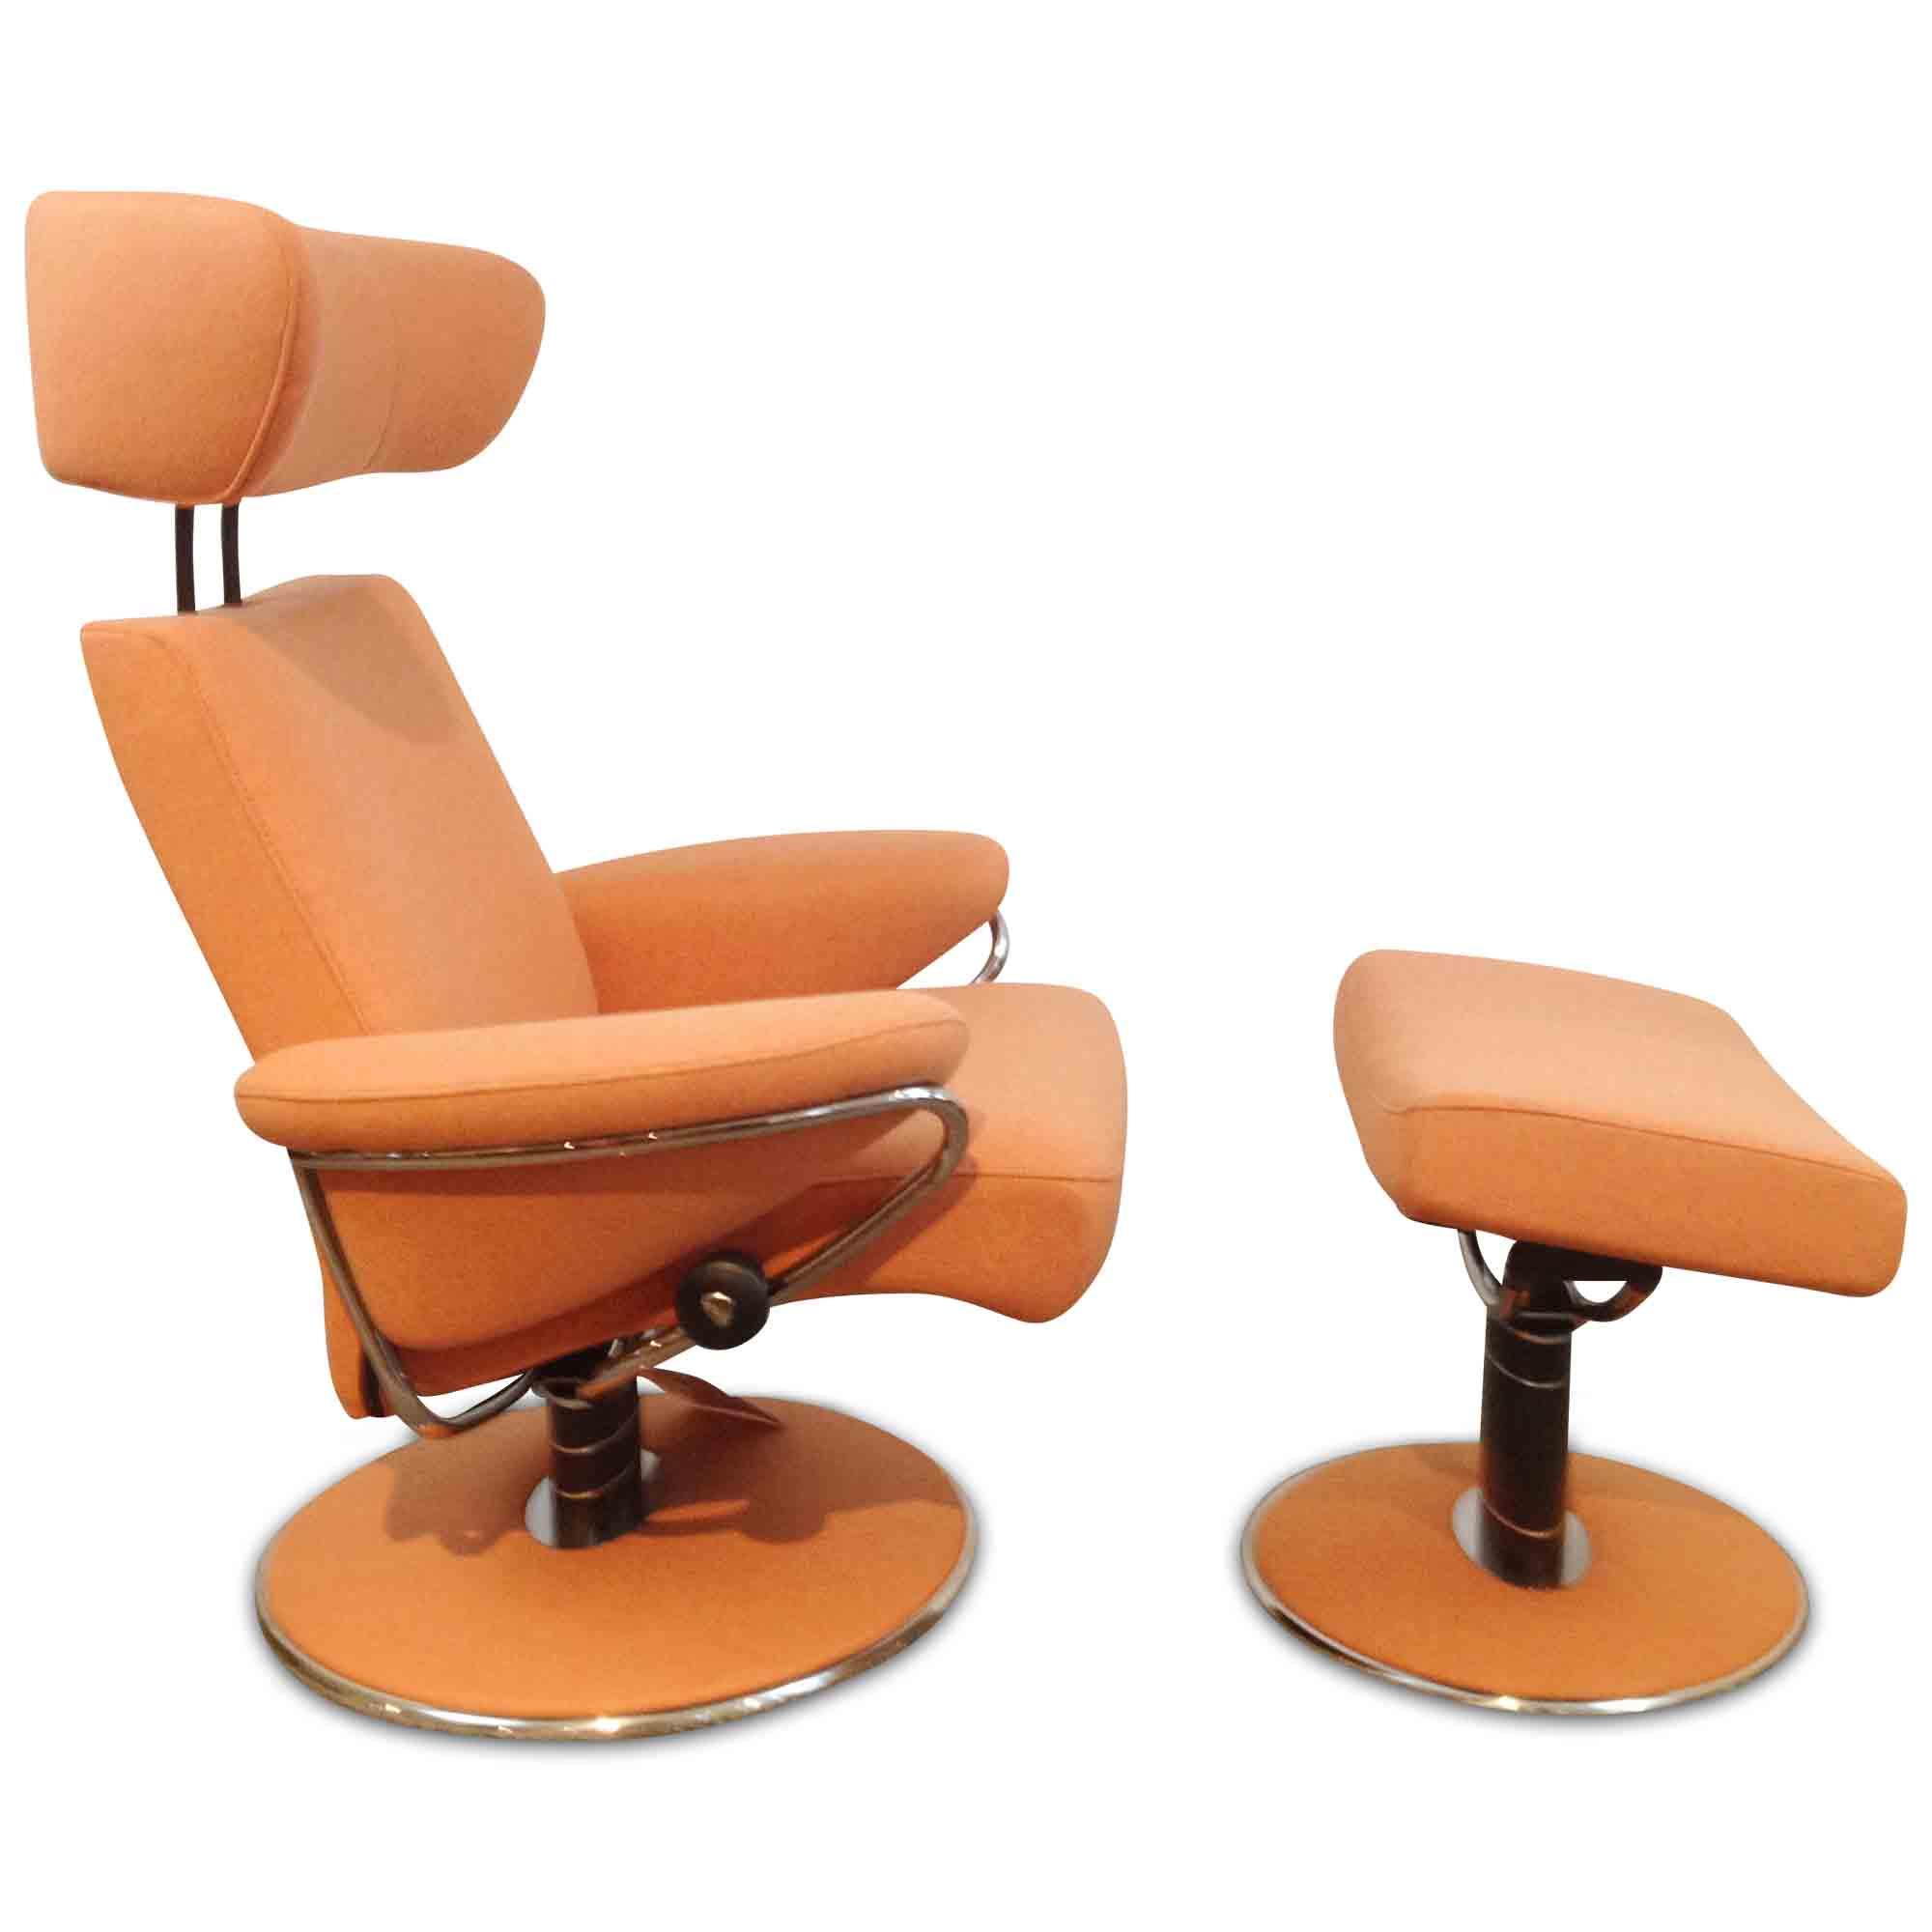 stressless designer sessel jazz mit hocker stoff metall orange silber ebay. Black Bedroom Furniture Sets. Home Design Ideas